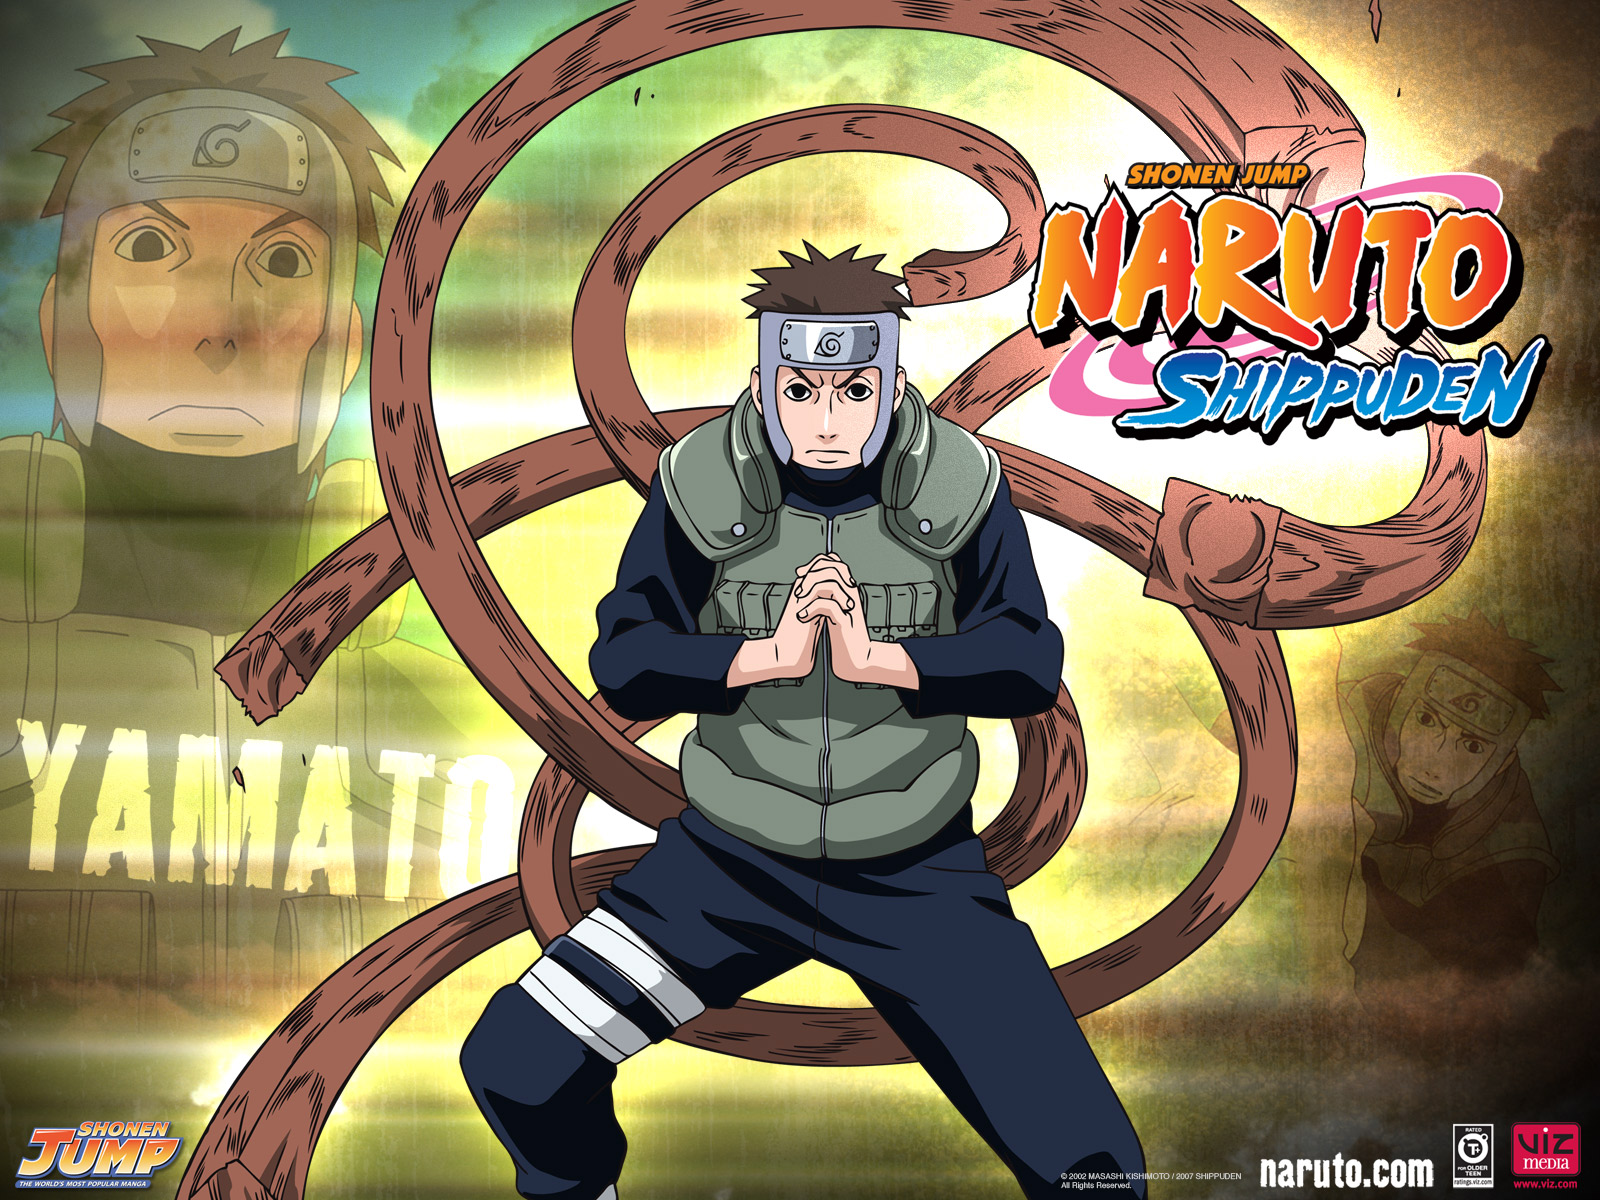 Naruto Shippuden  Yamato,Tenzo Part 3 Wallpaper